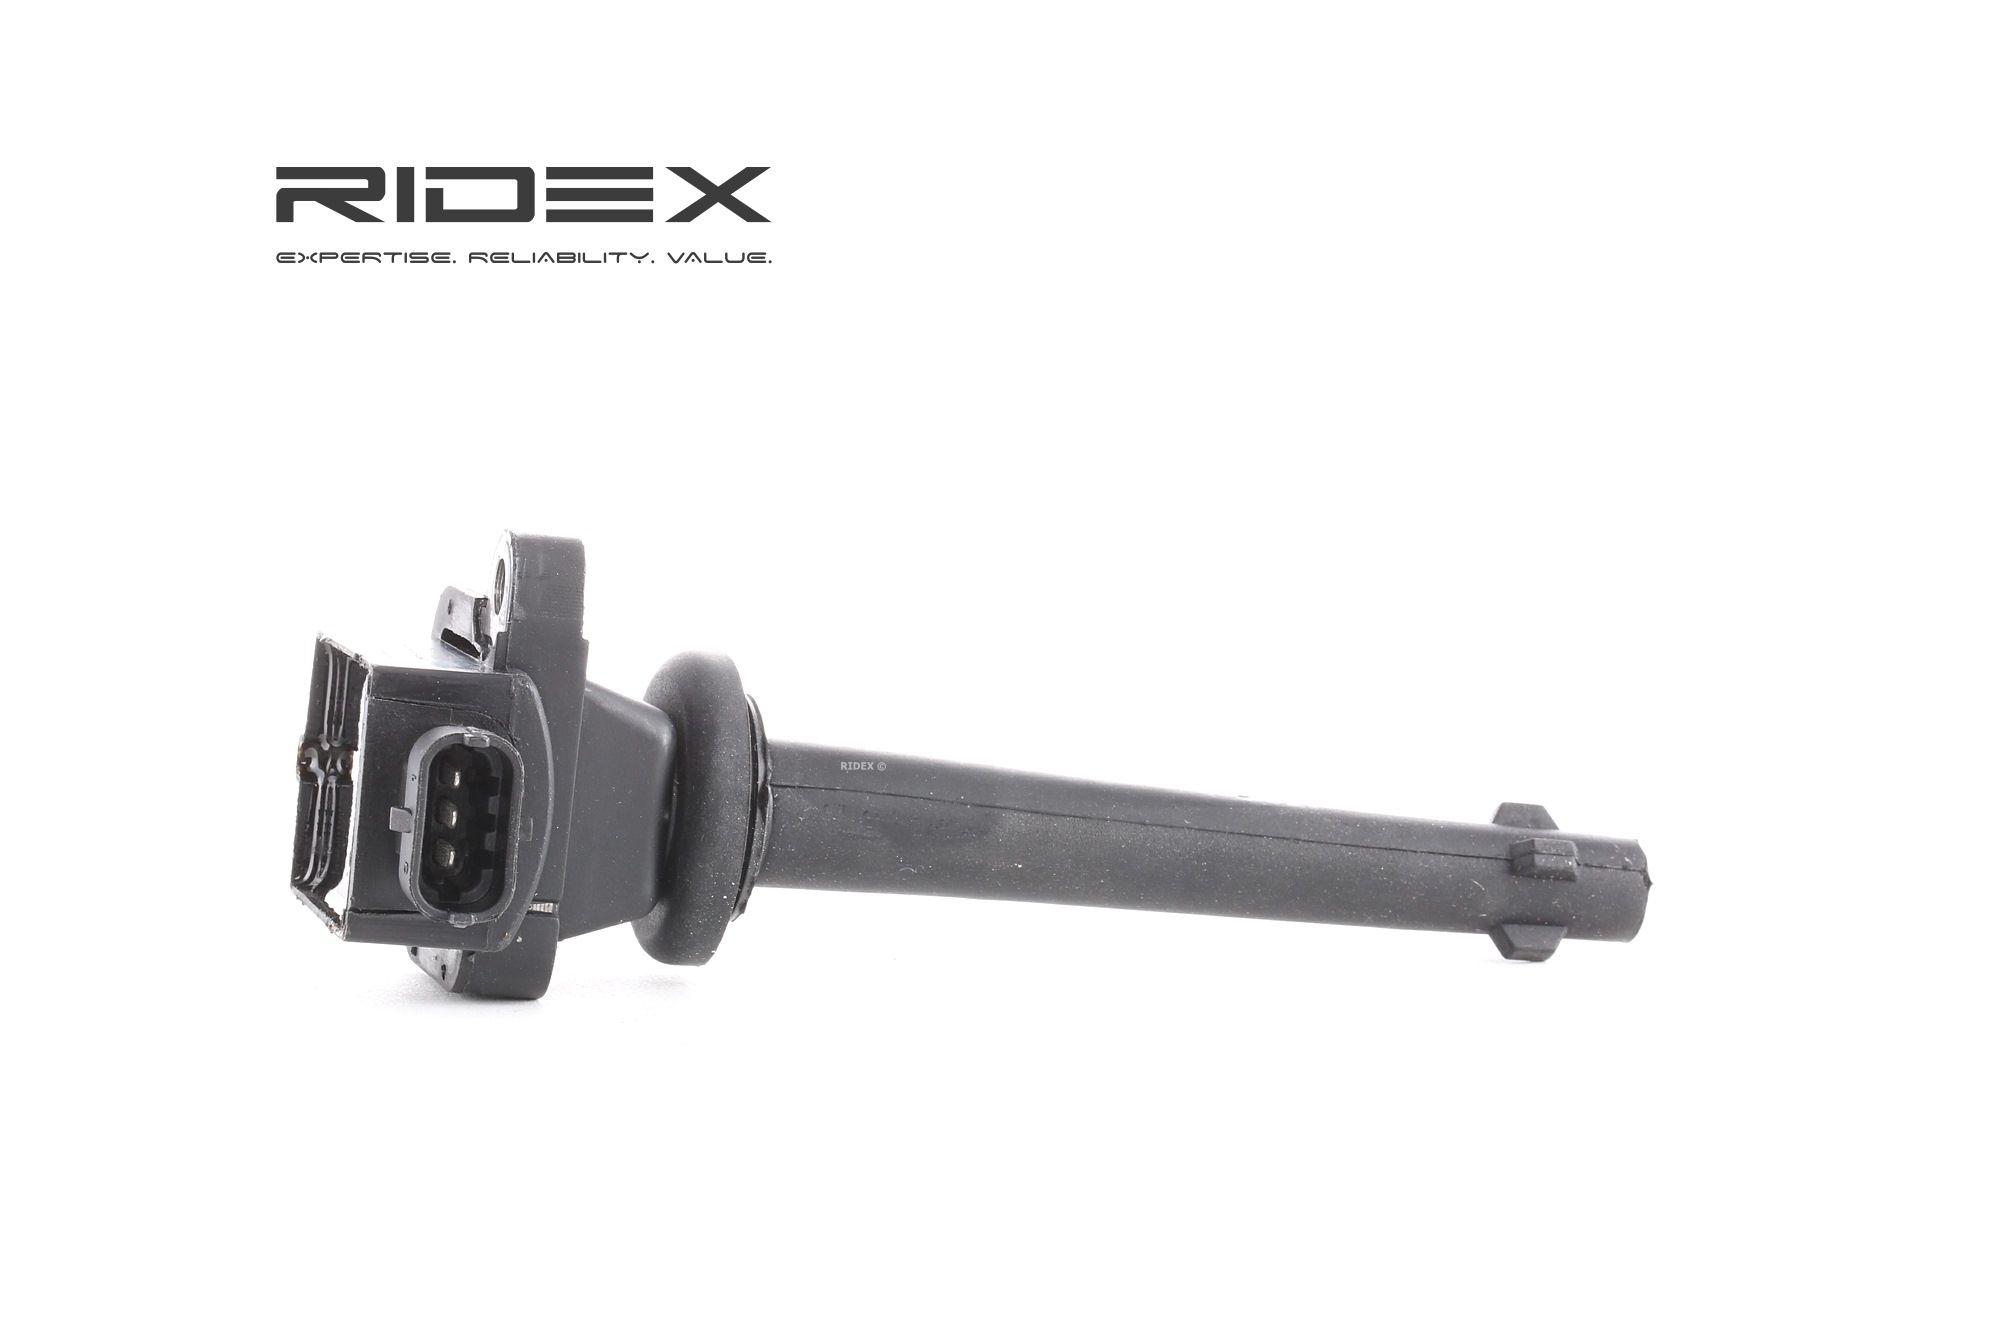 Zündspule RIDEX 689C0293 Bewertung